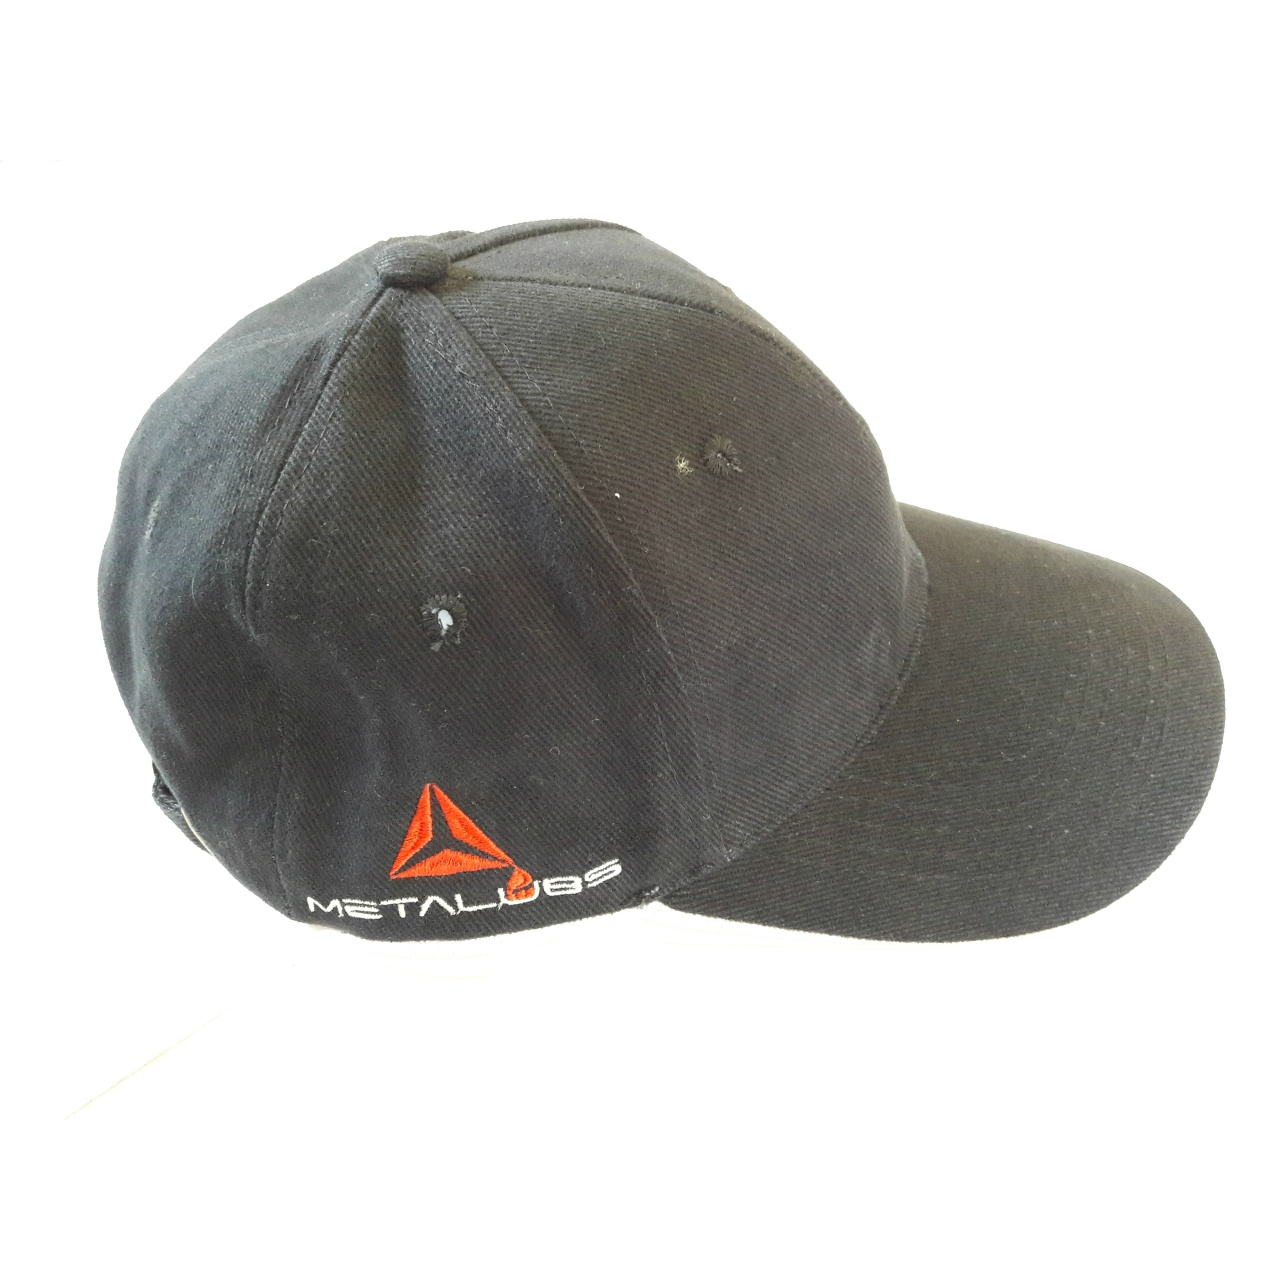 Metalubs cap